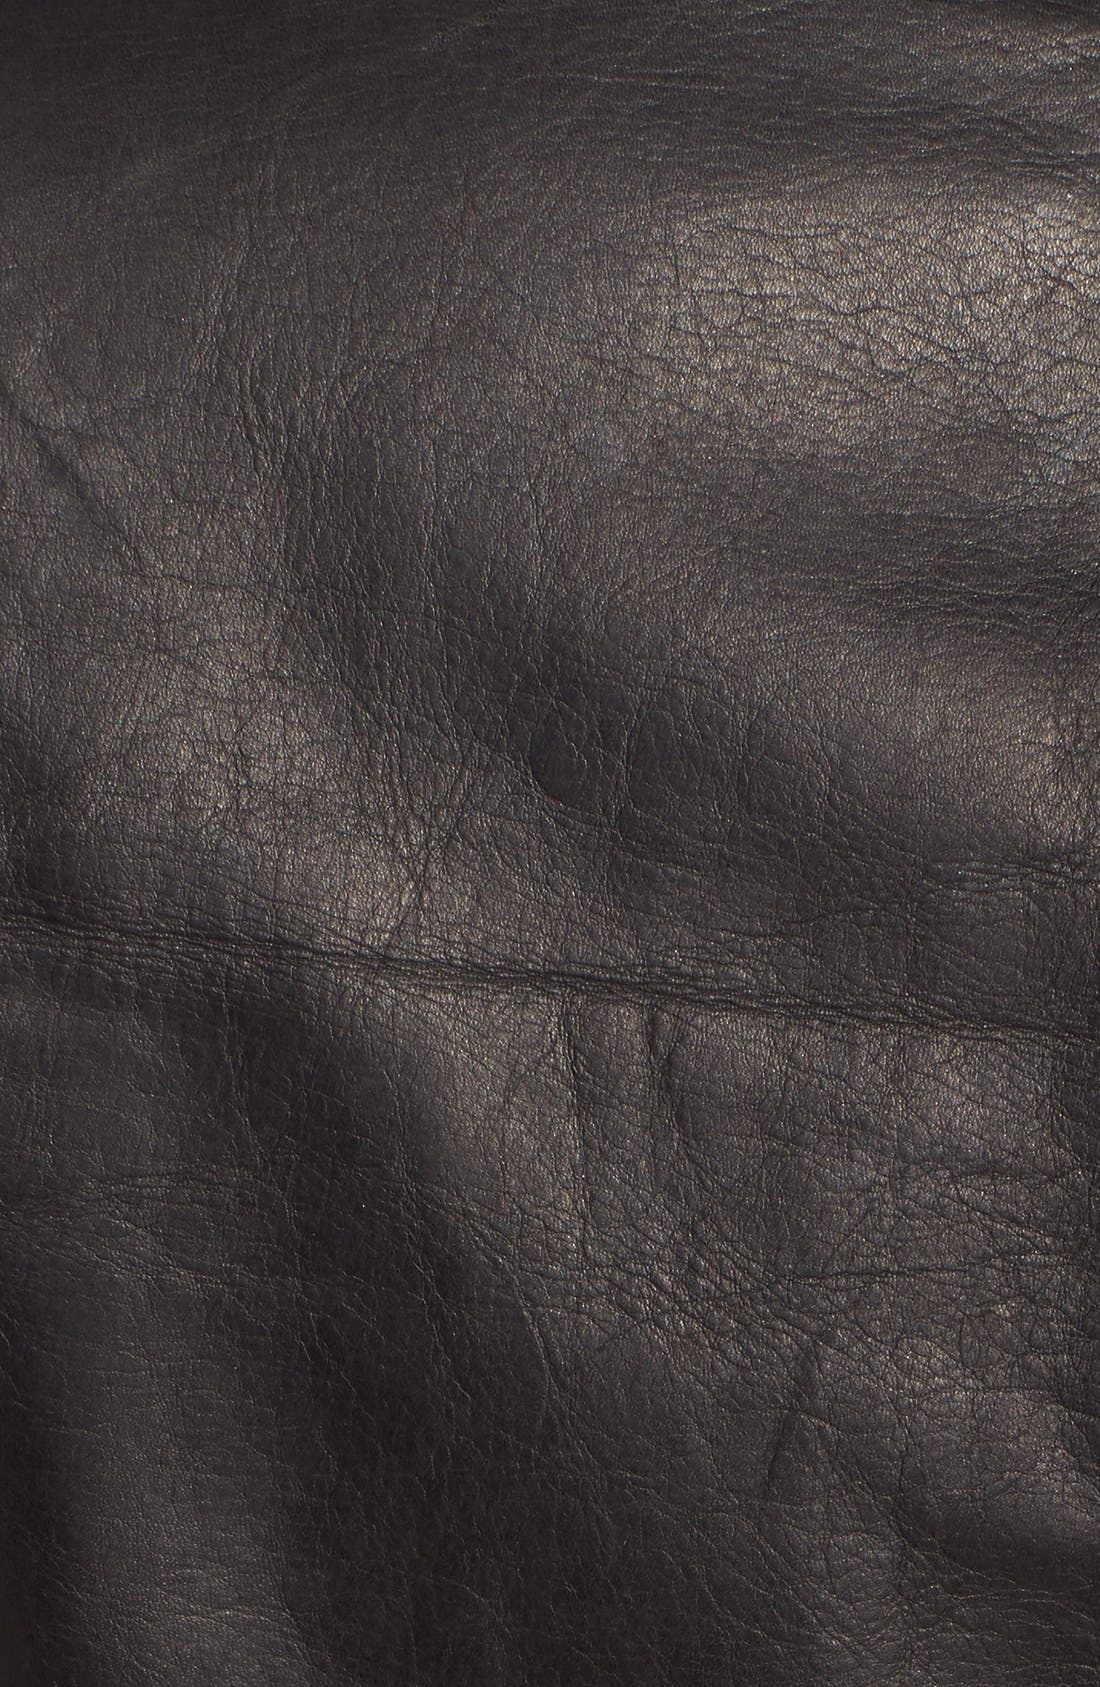 REBECCA MINKOFF, 'Nana' Leather Moto Jacket, Alternate thumbnail 3, color, 001